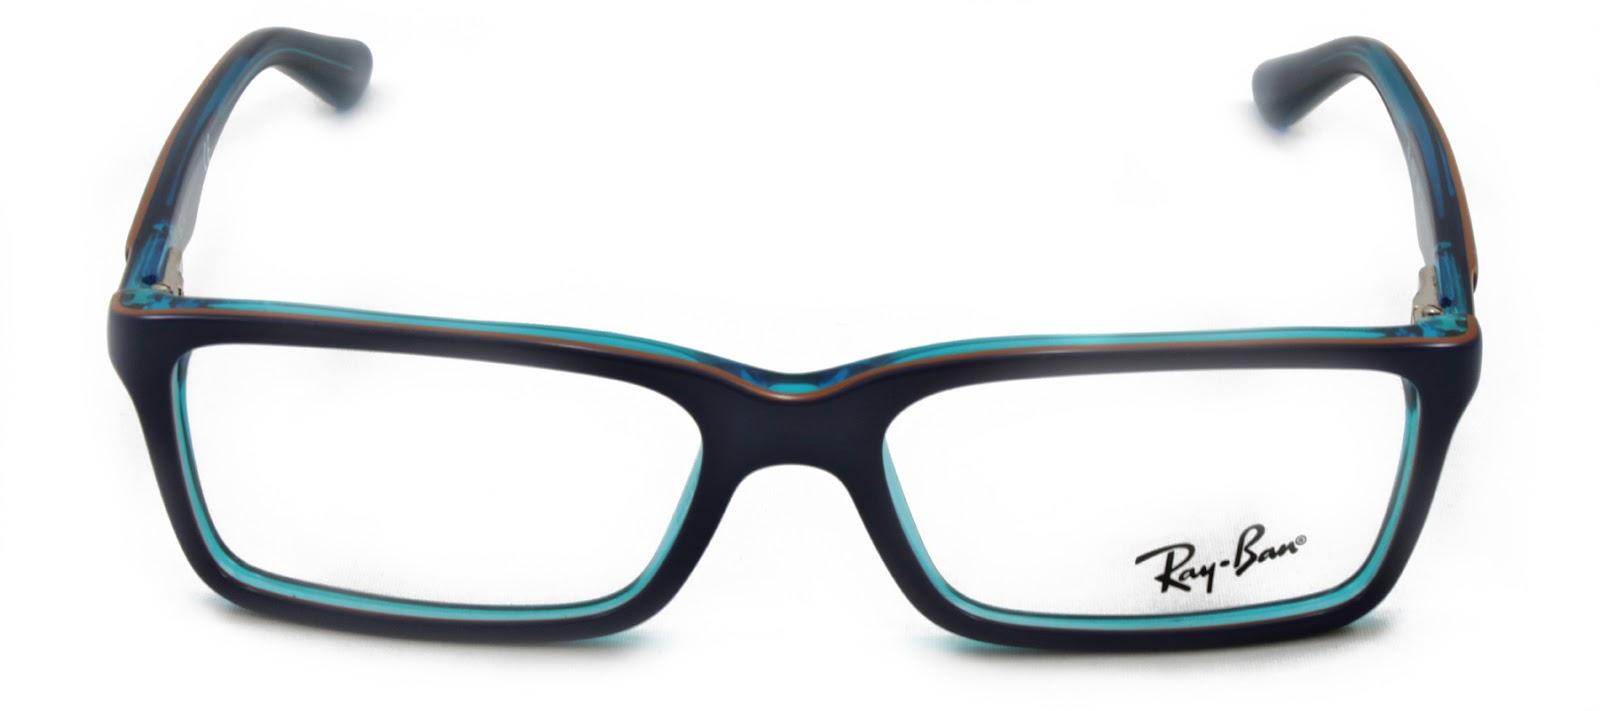 ray ban gafas graduadas mujer